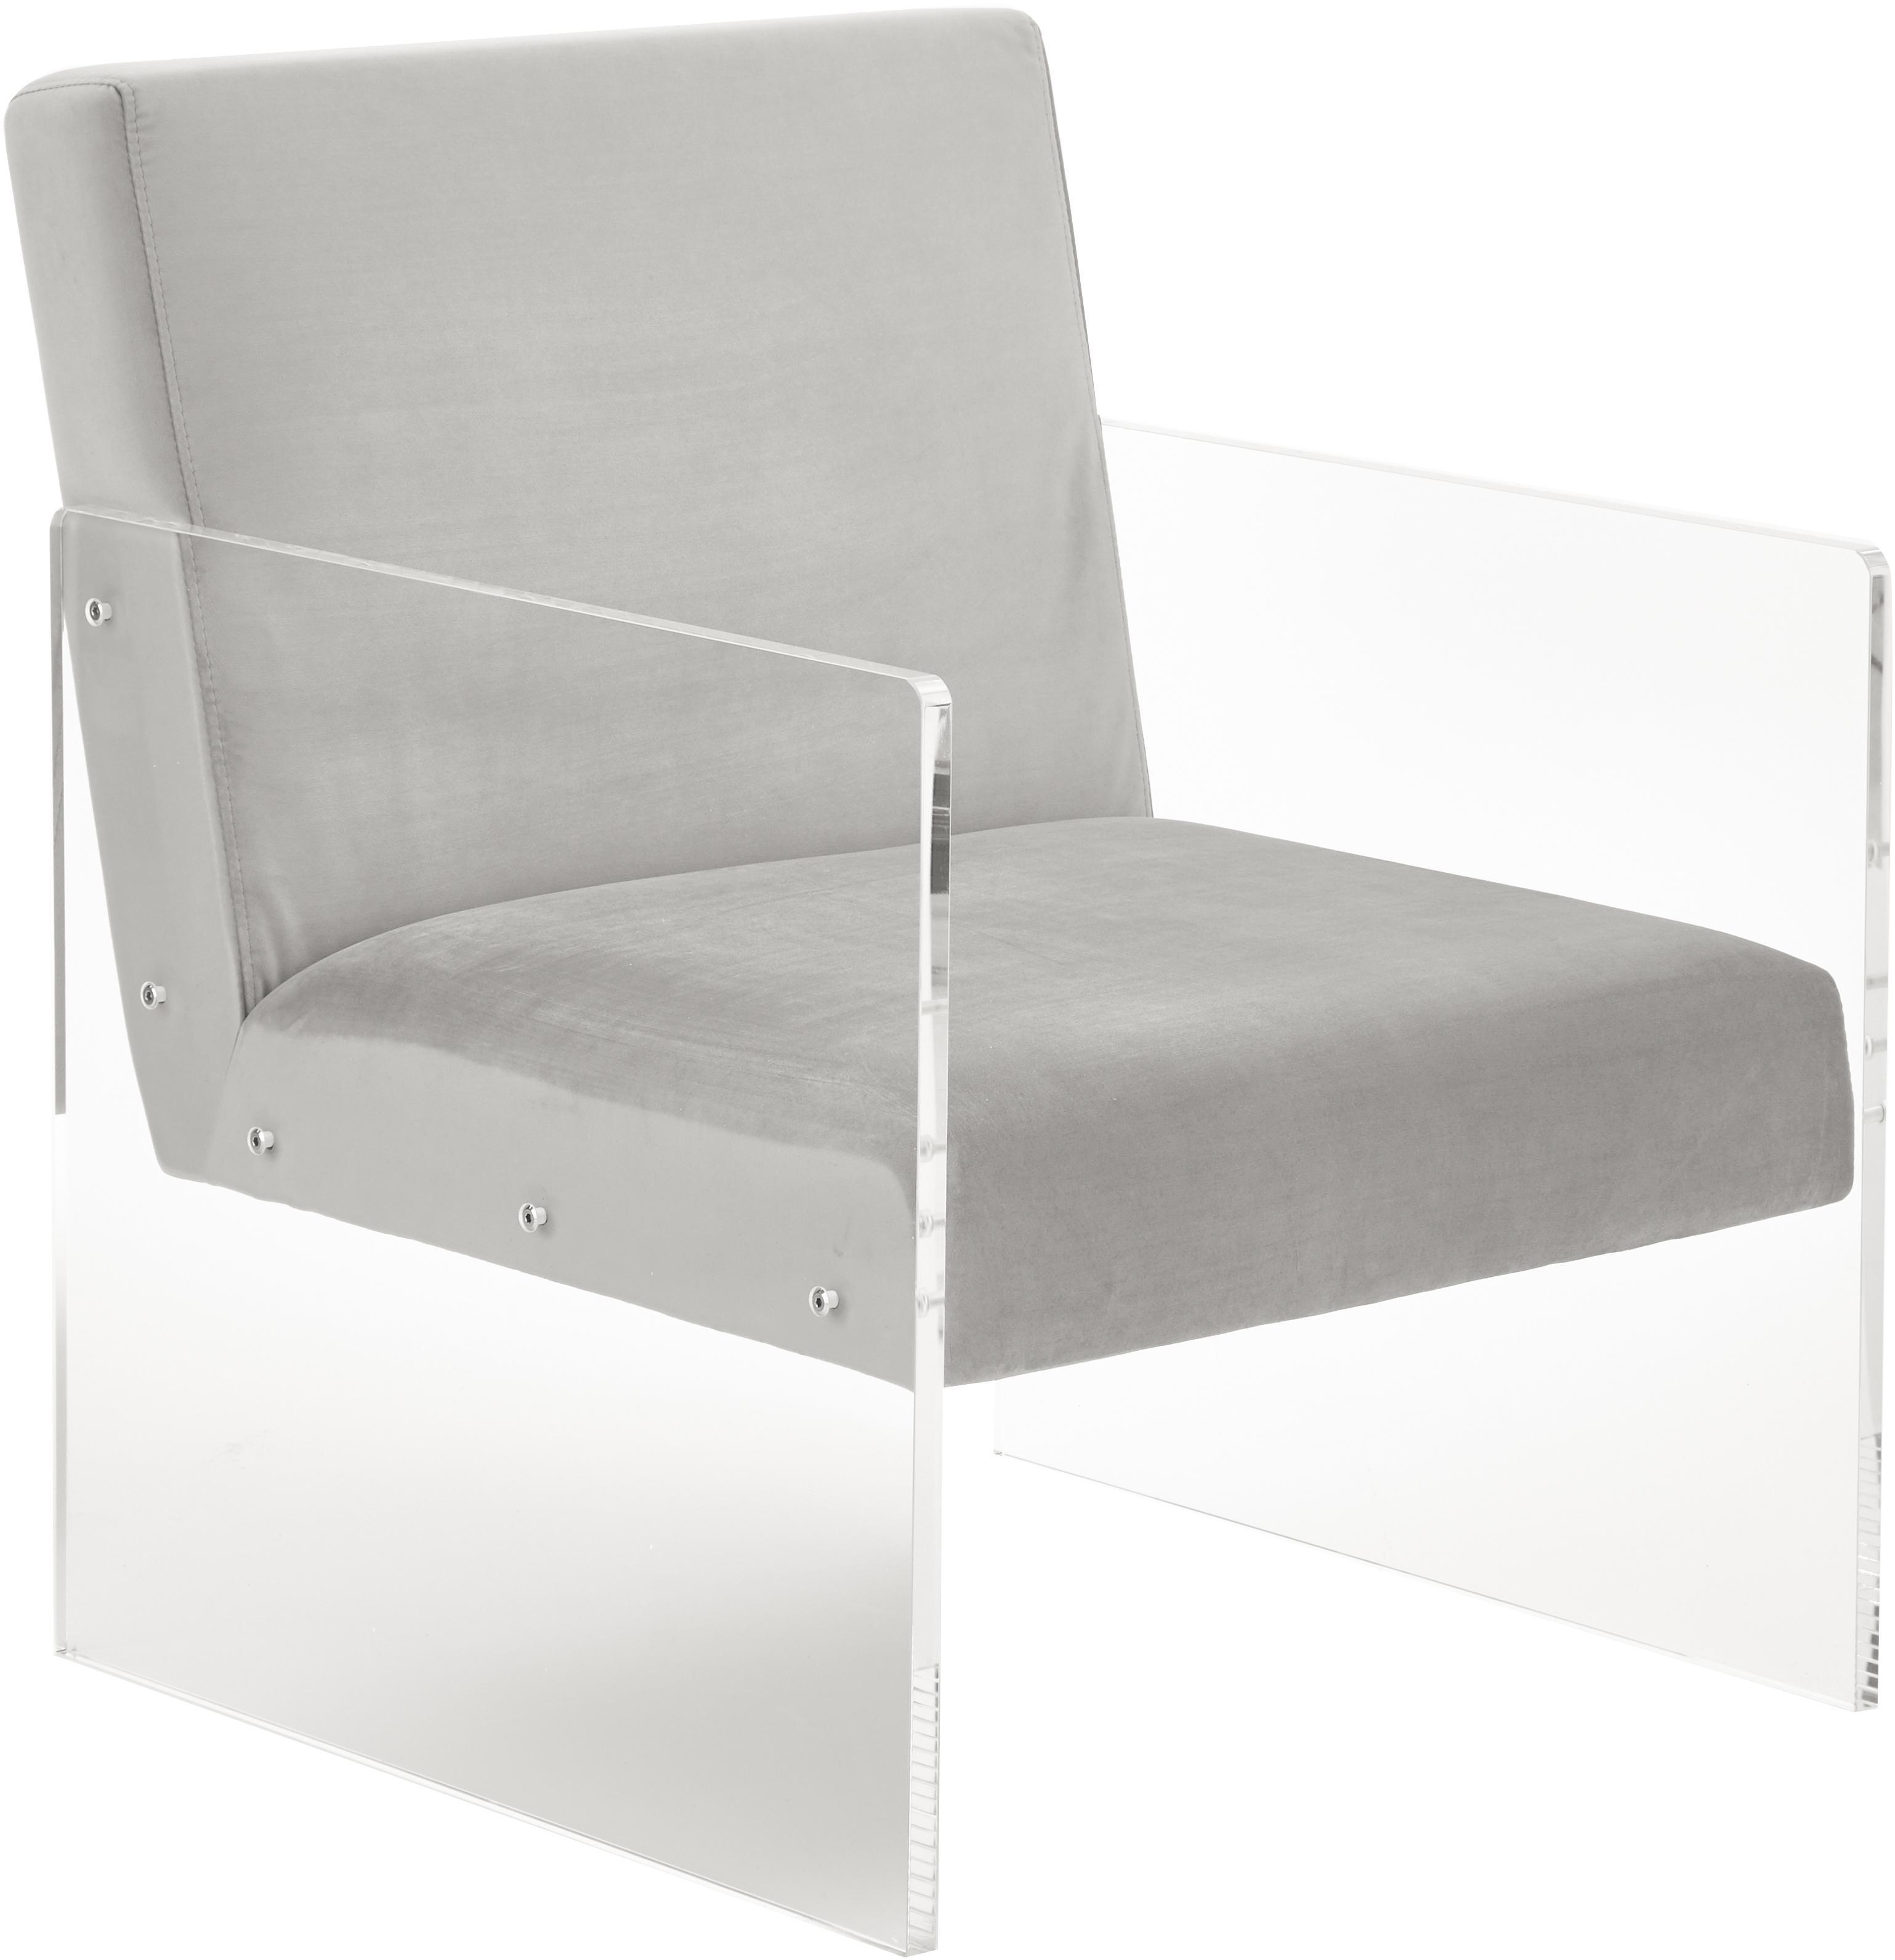 Samt-Loungesessel Ayden, Bezug: Samt (Polyester) 25.000 S, Gestell: Massives Pappelholz, Sper, Beine: Acrylglas, Samt Hellgrau, B 64 x T 74 cm